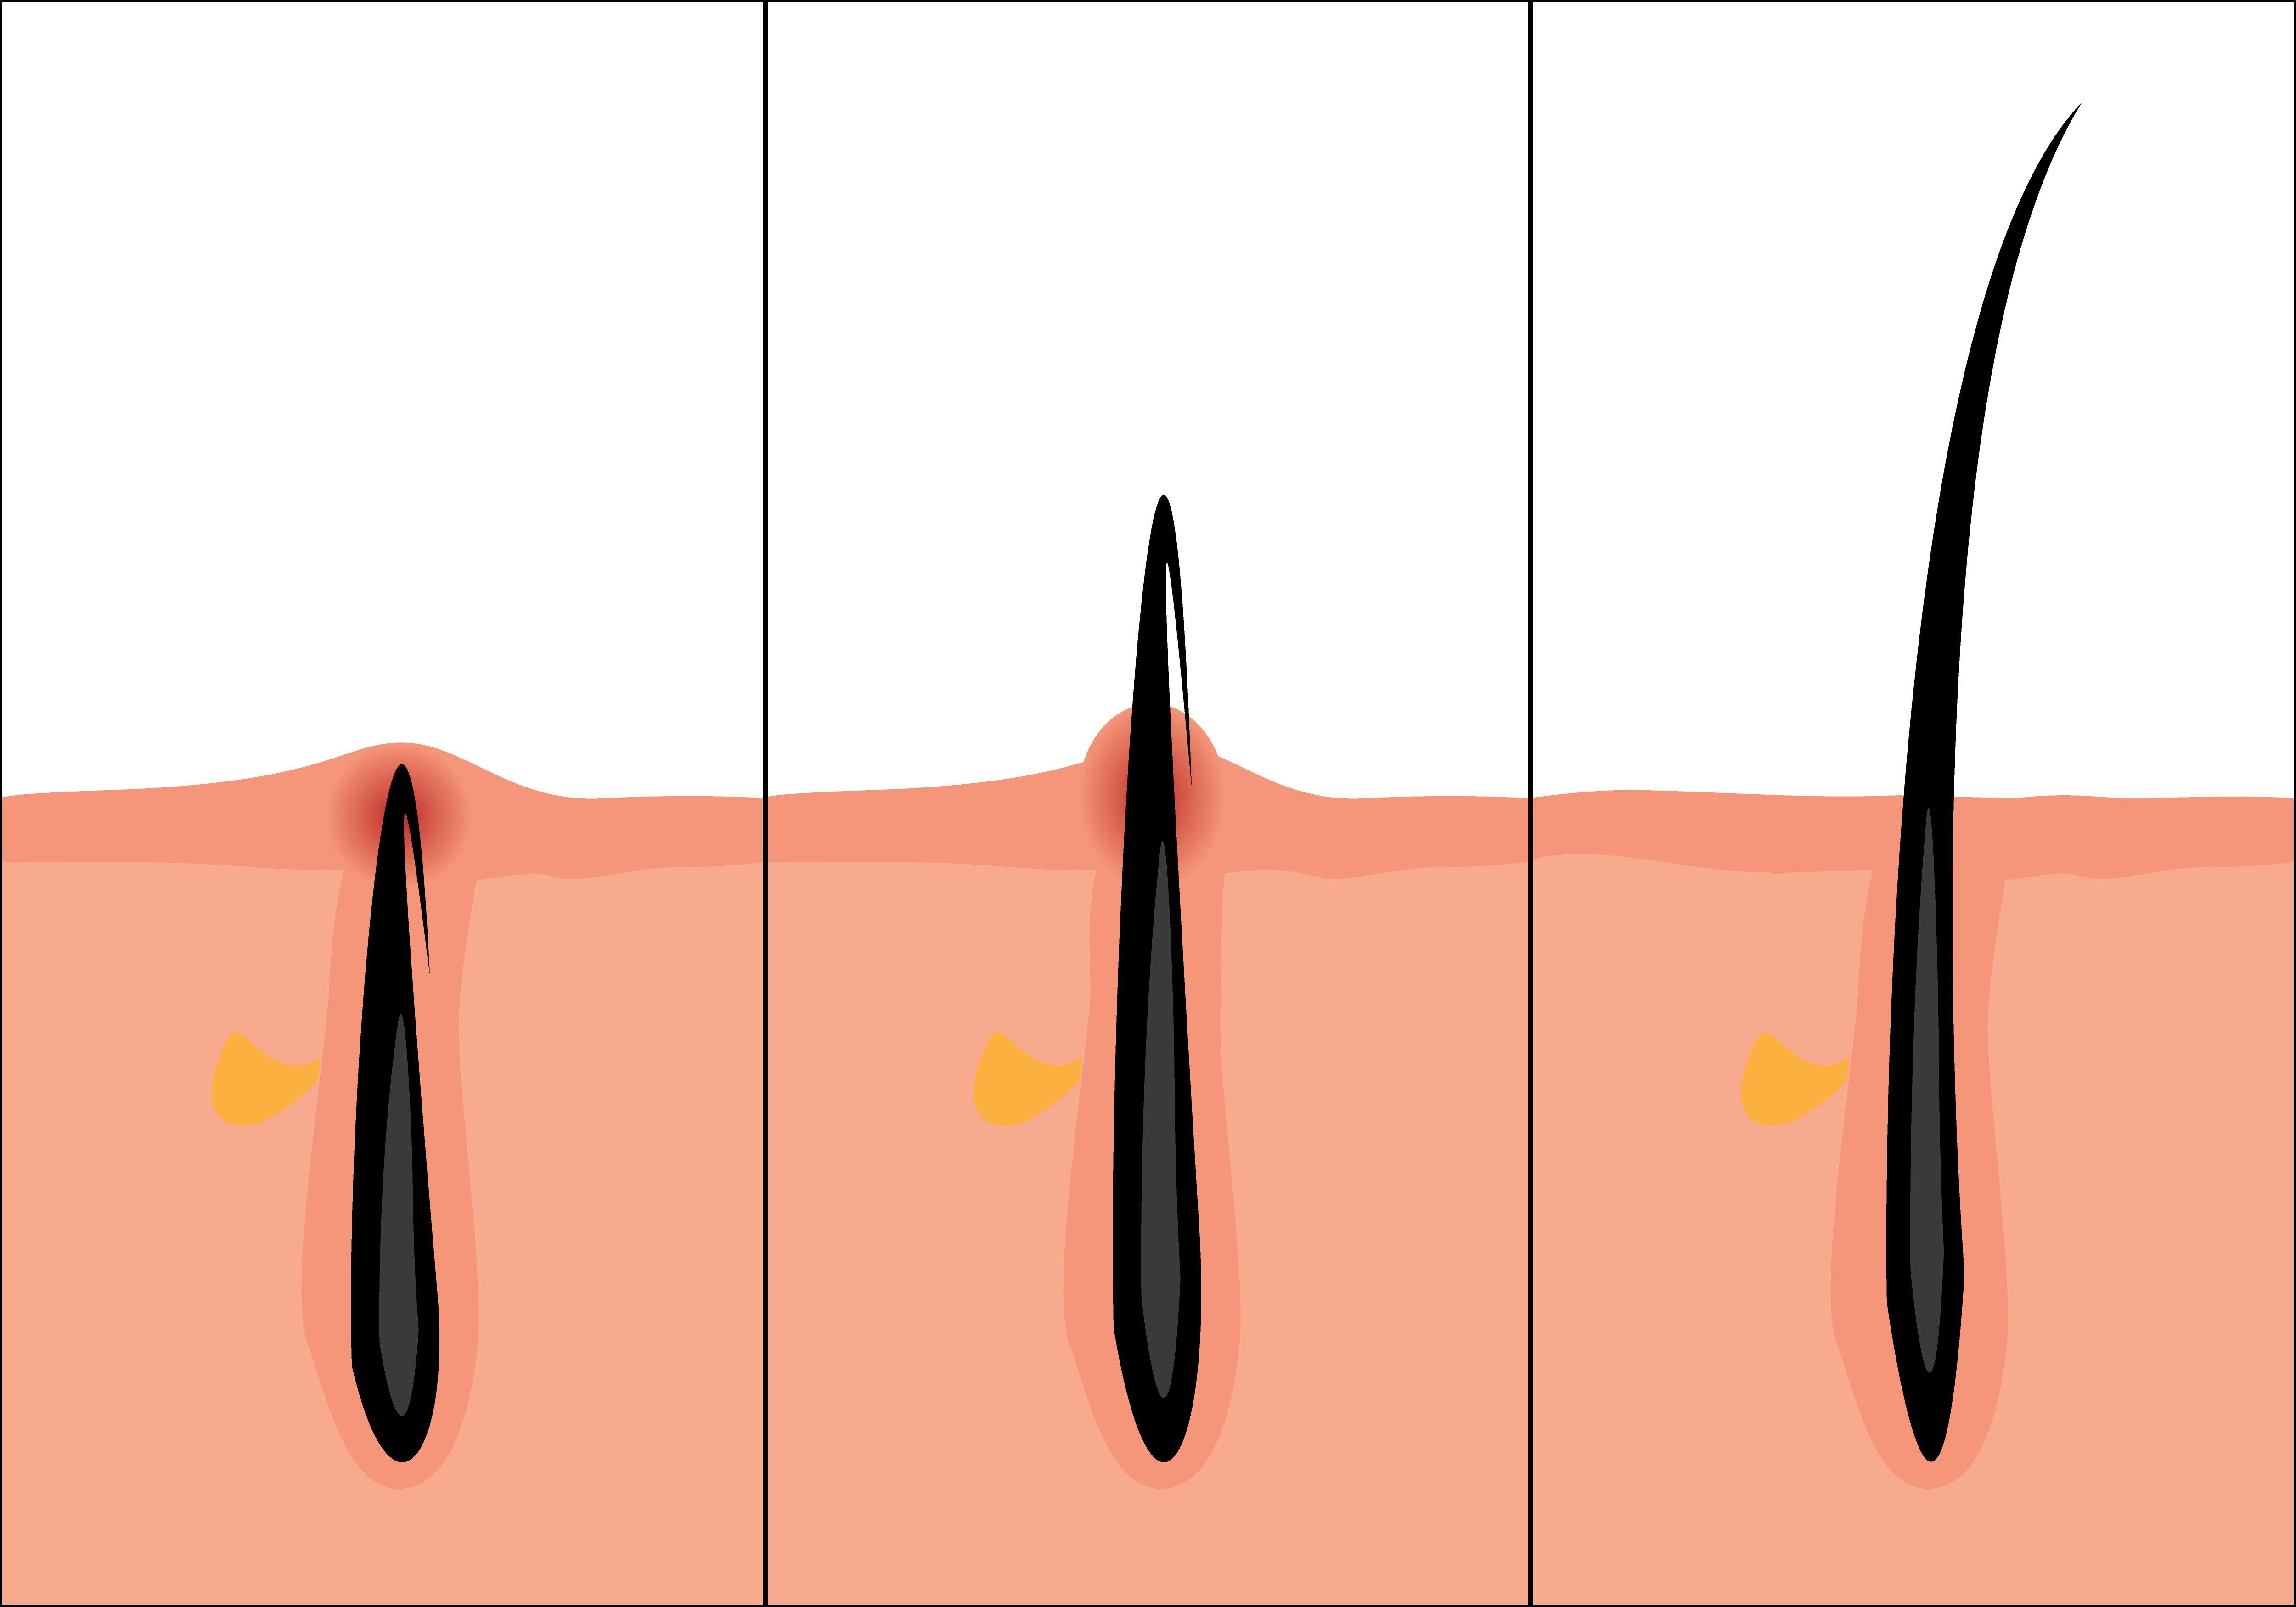 Eingewachsenes Haar versus normales Haar